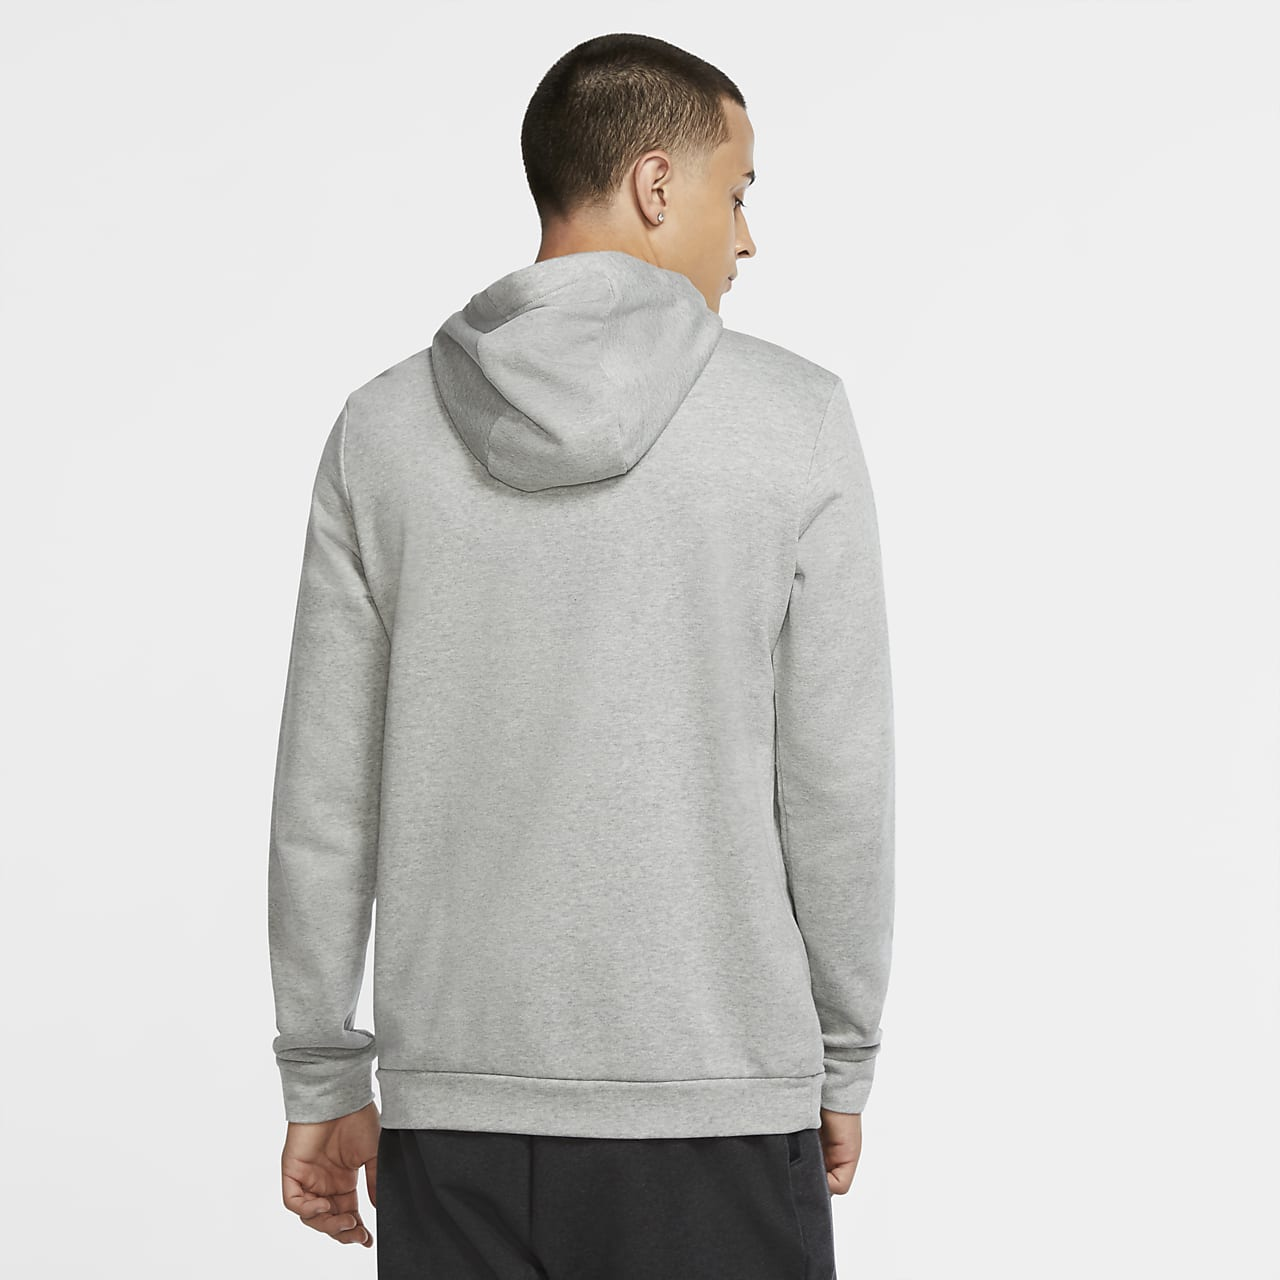 Nike Dri-FIT Men's Training Pullover Hoodie CU6021-063